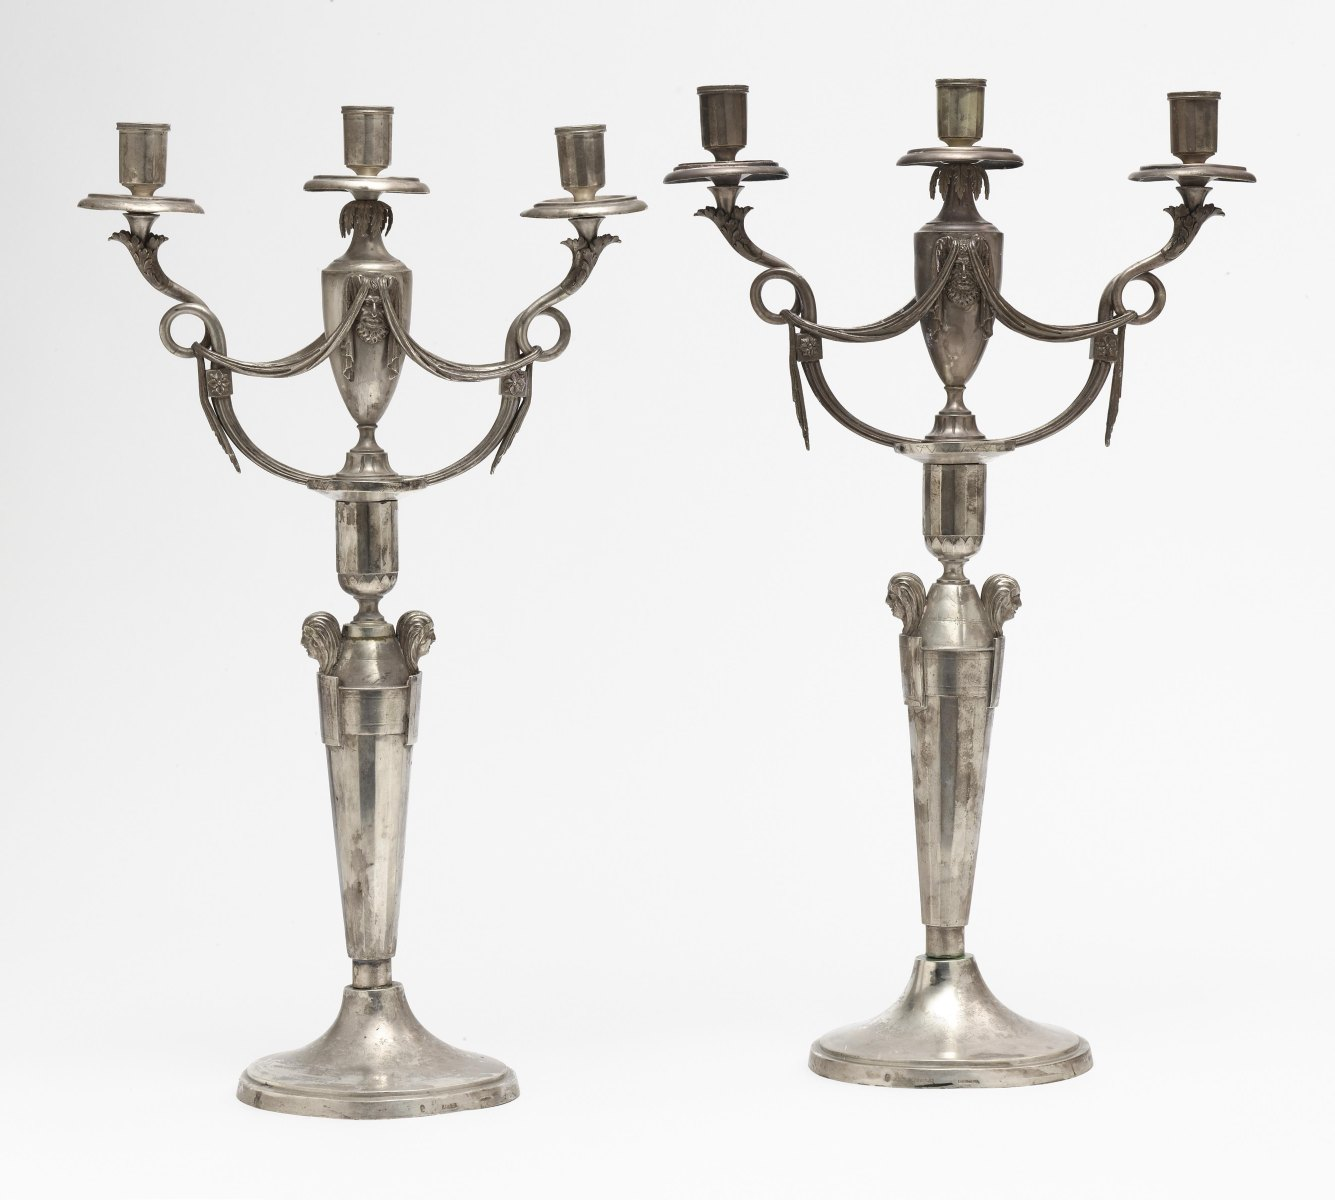 A pair of three-light girandoles